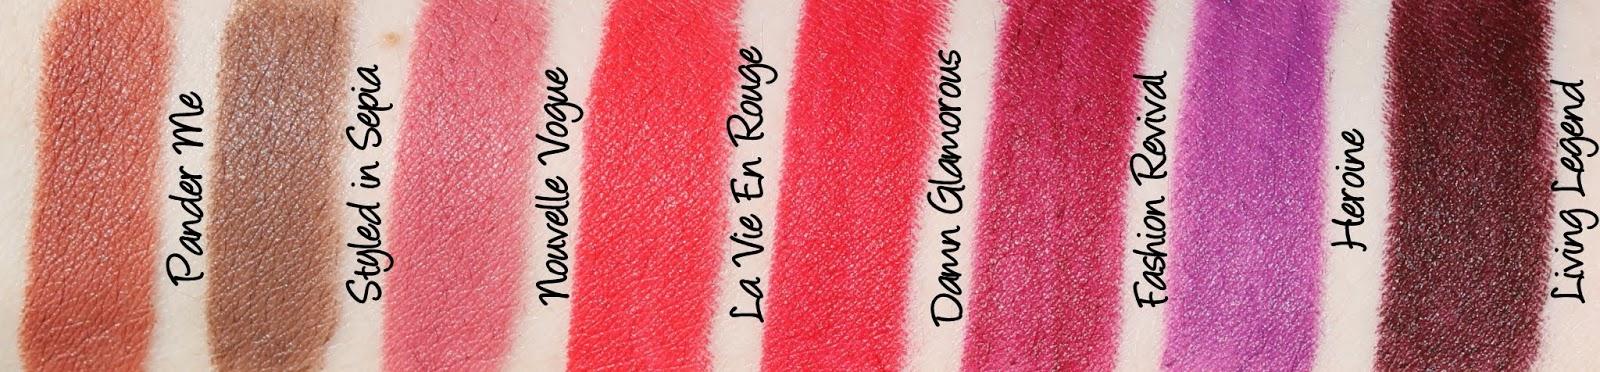 MAC Monday: The Matte Lip Lipsticks Swatches & Review